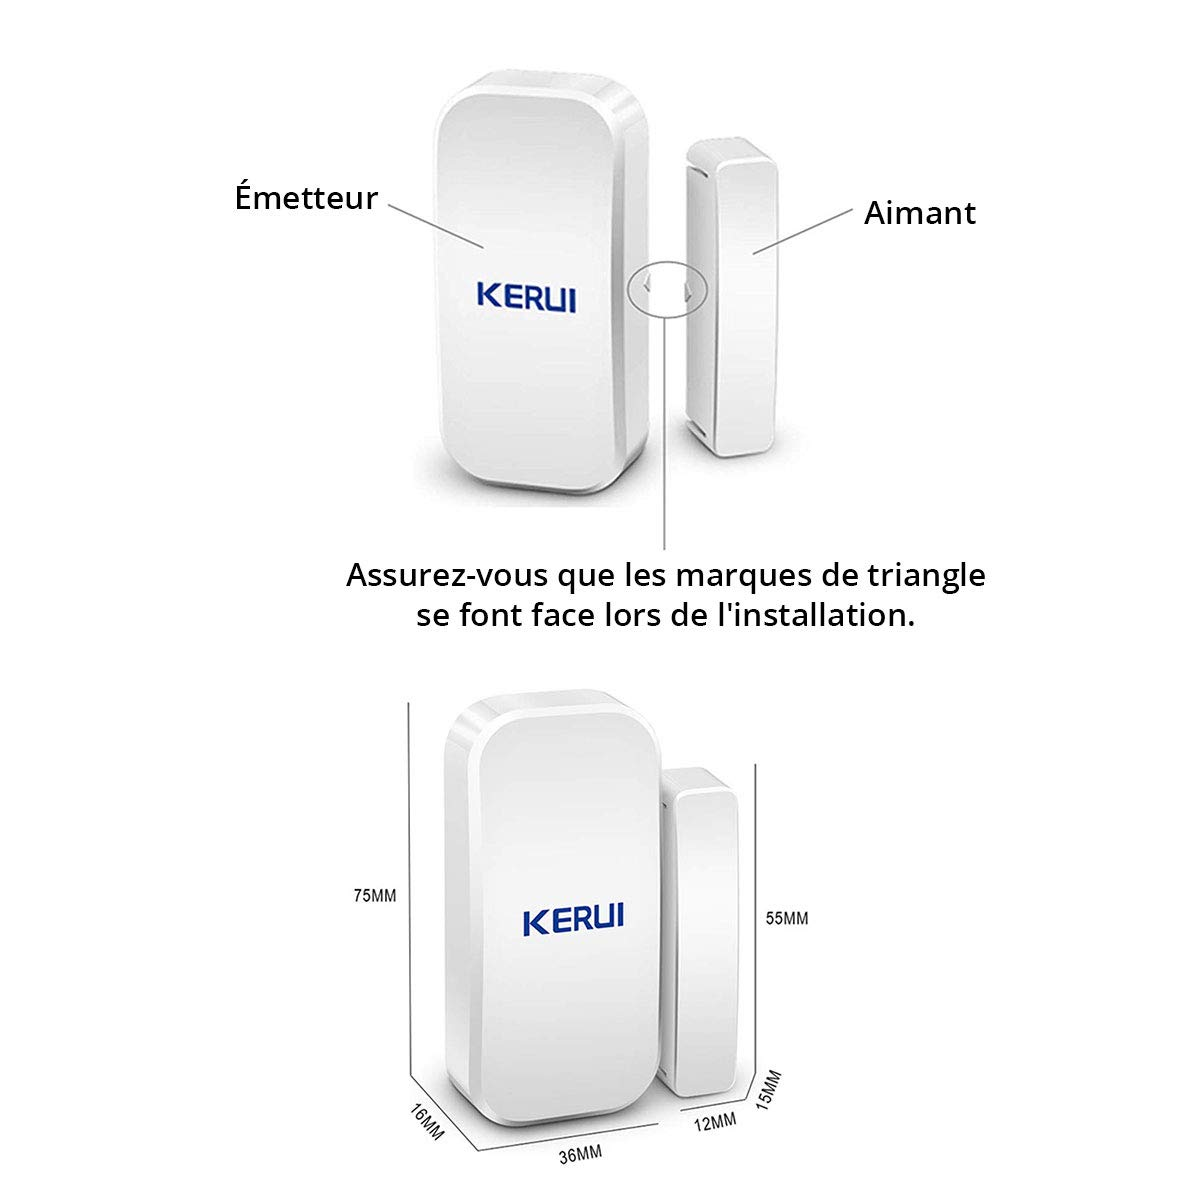 KERUI/3 x Magnetic Wireless Sensor Intruder Alarms for Doors and Windows